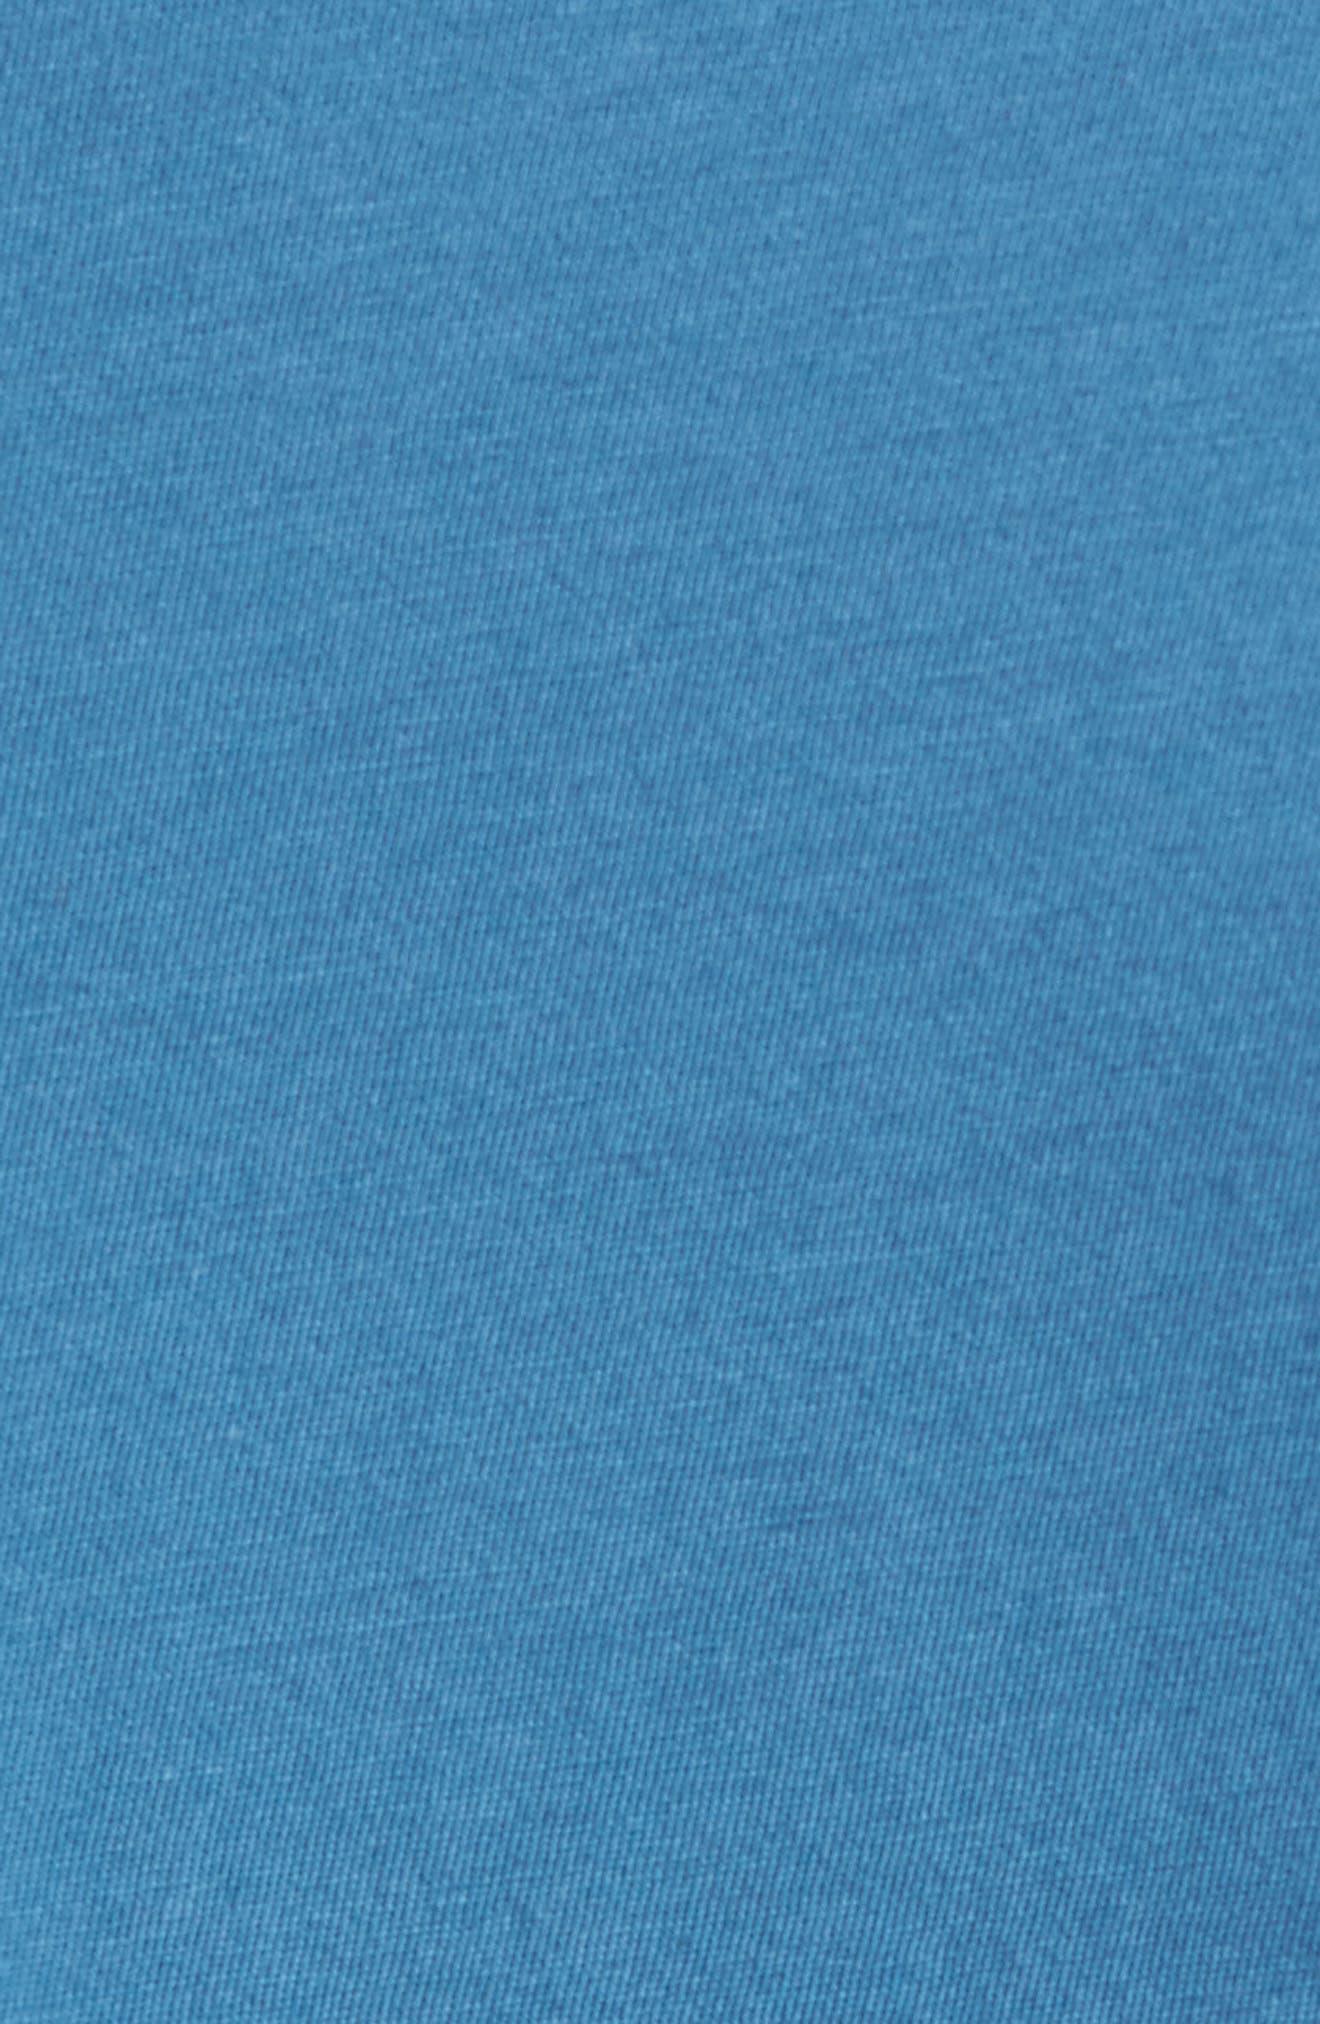 Slim Fit T-Shirt,                             Alternate thumbnail 5, color,                             SANTORINI